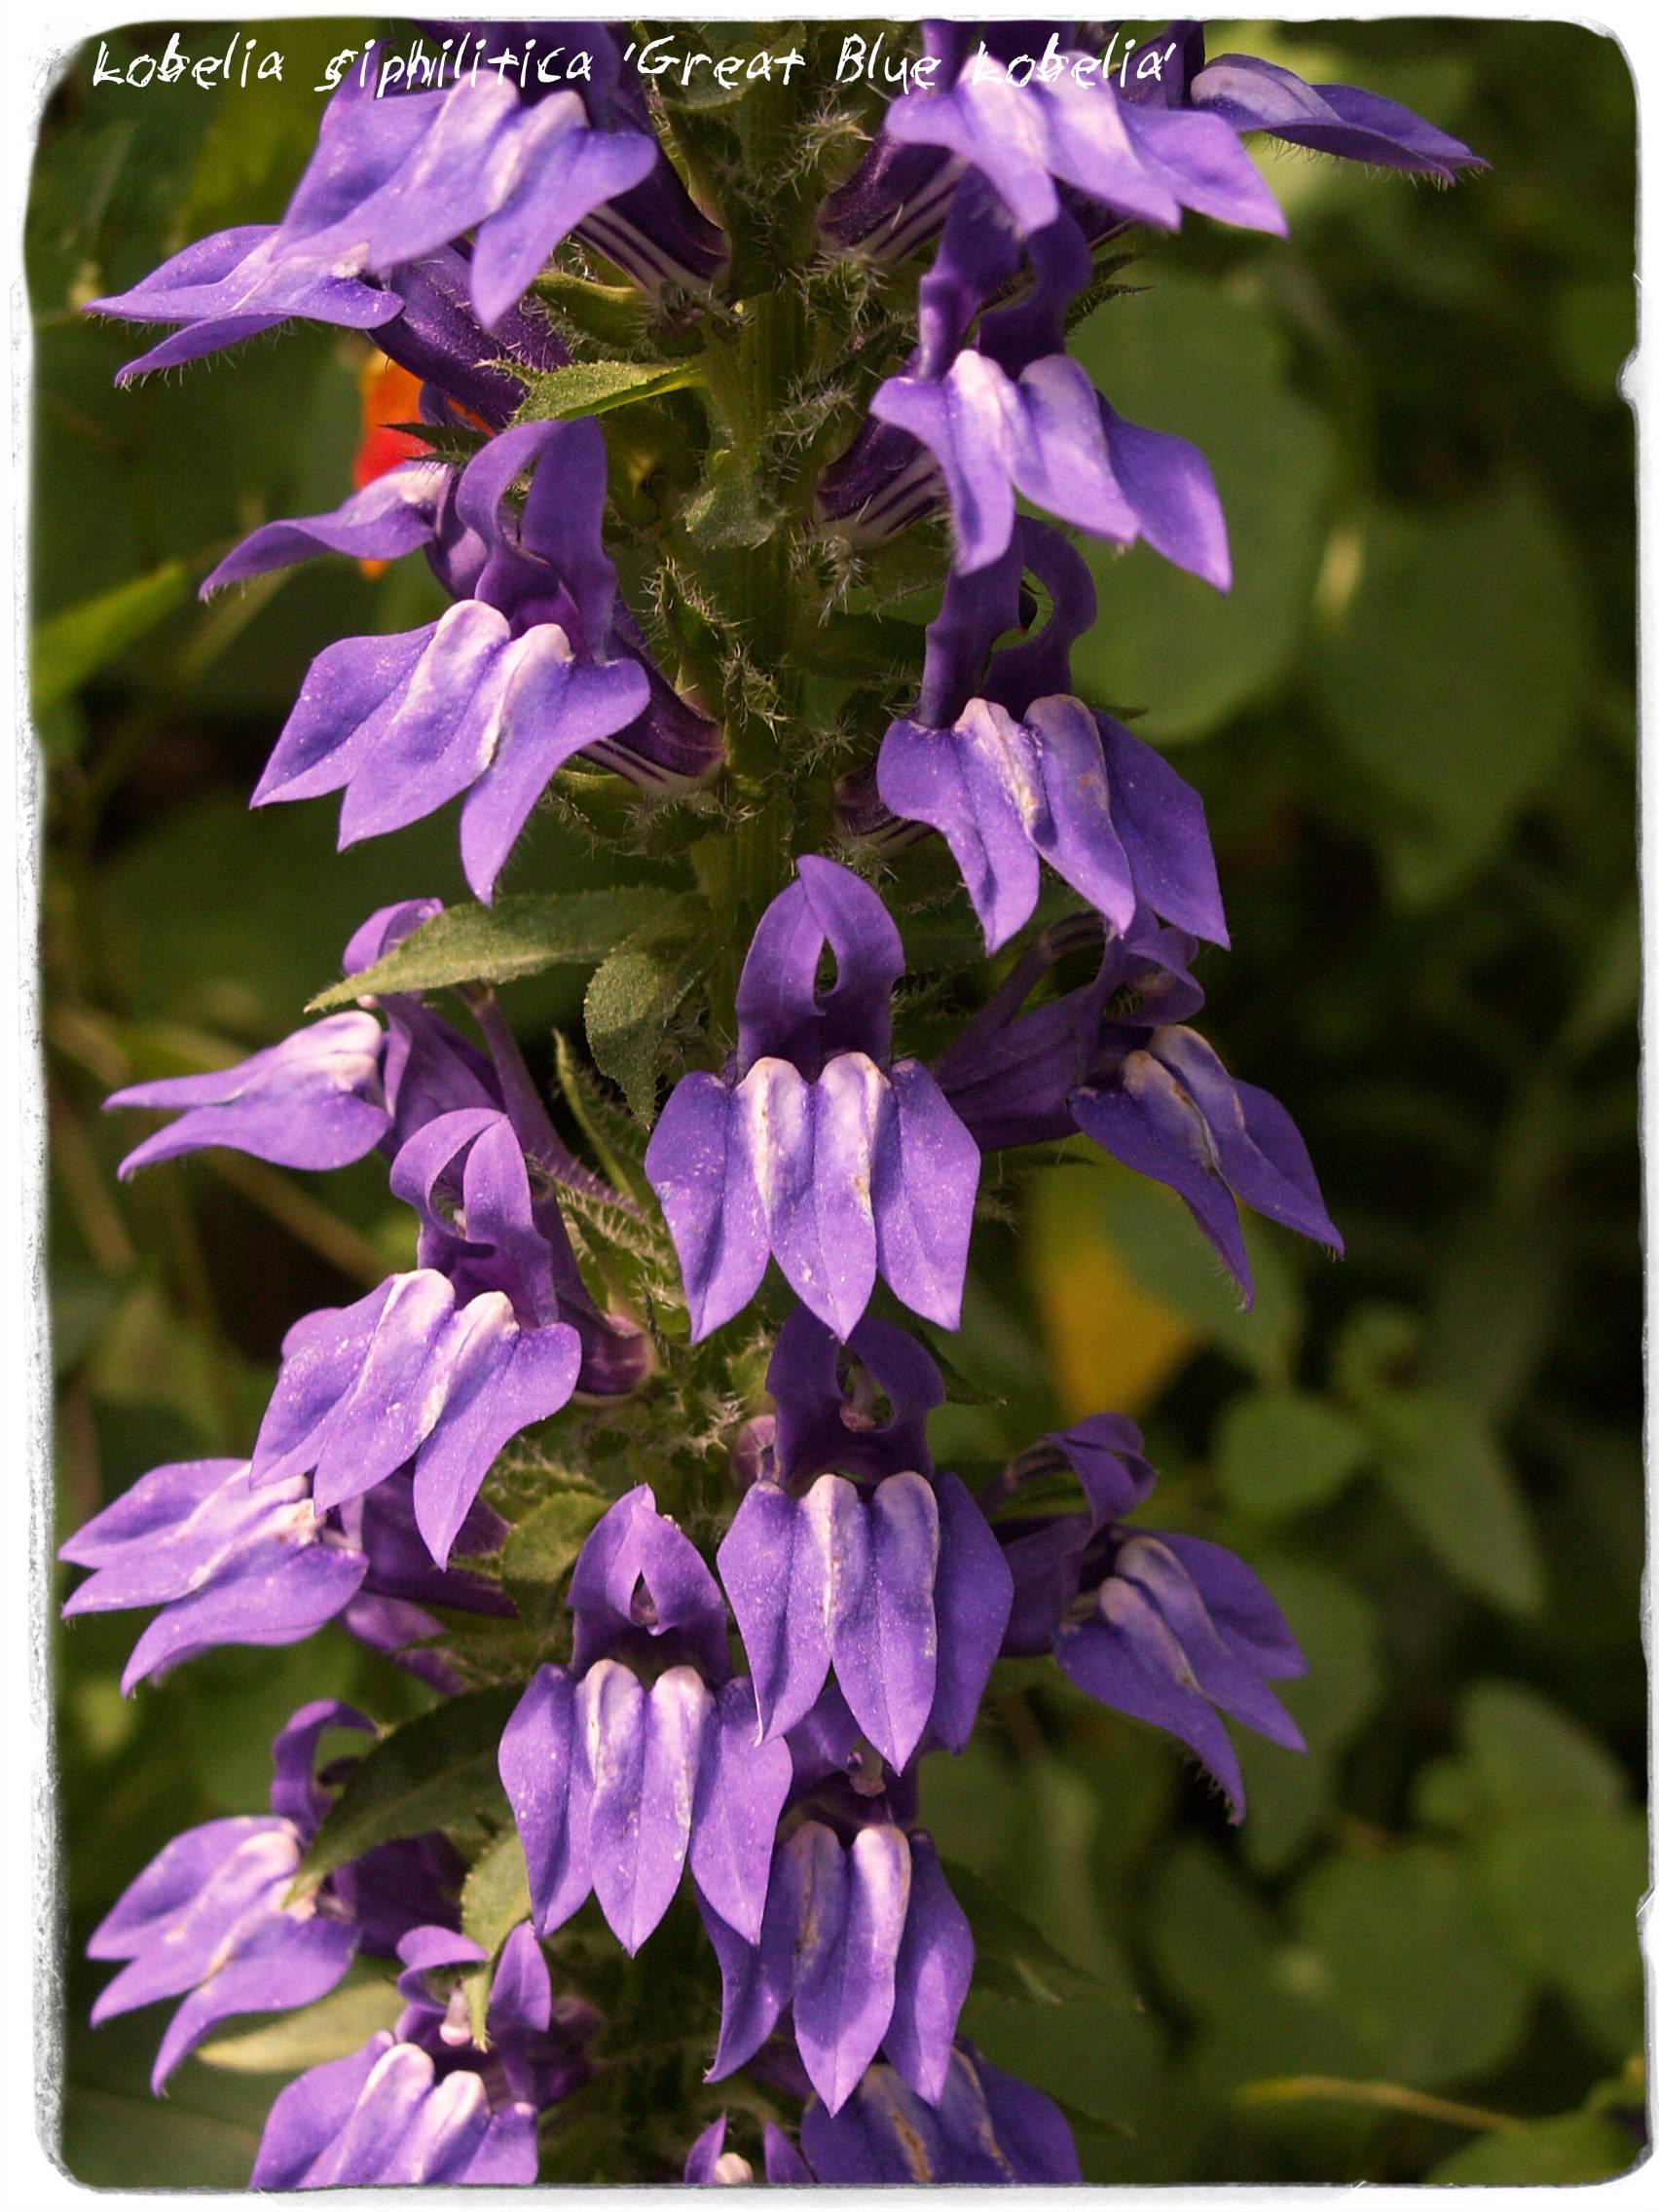 Lobelia Siphilitica Great Blue Lobelia 300 Seeds Etsy